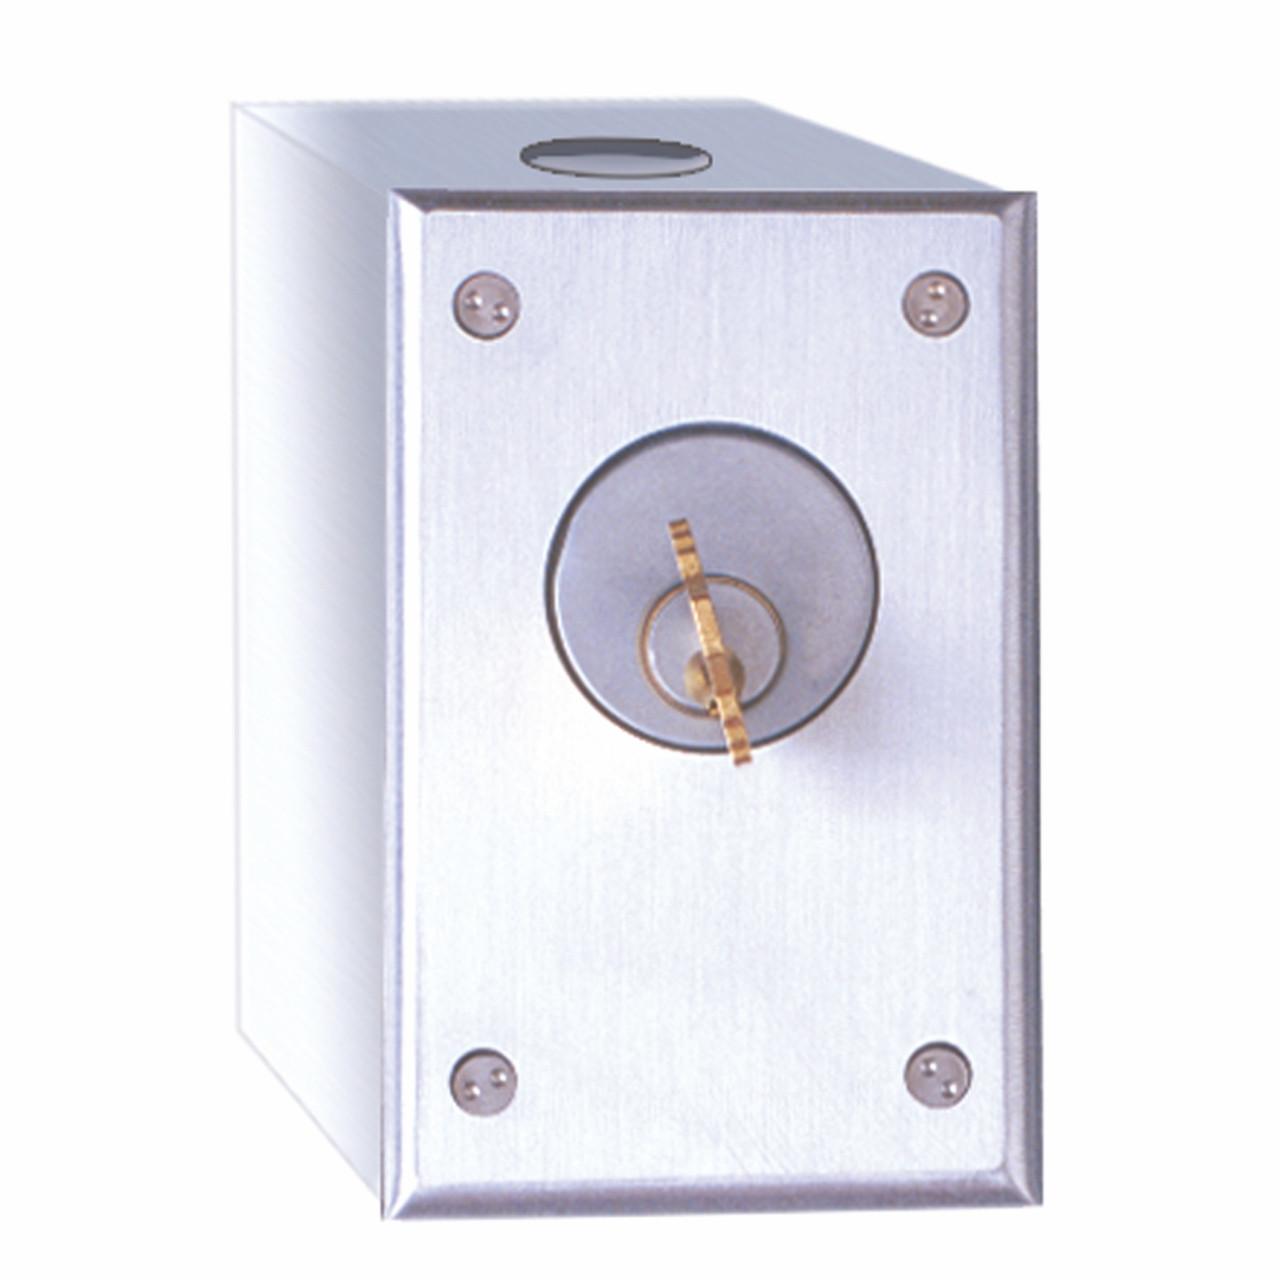 Camden Cm 1000 Series Surface Mount Key Switch Box